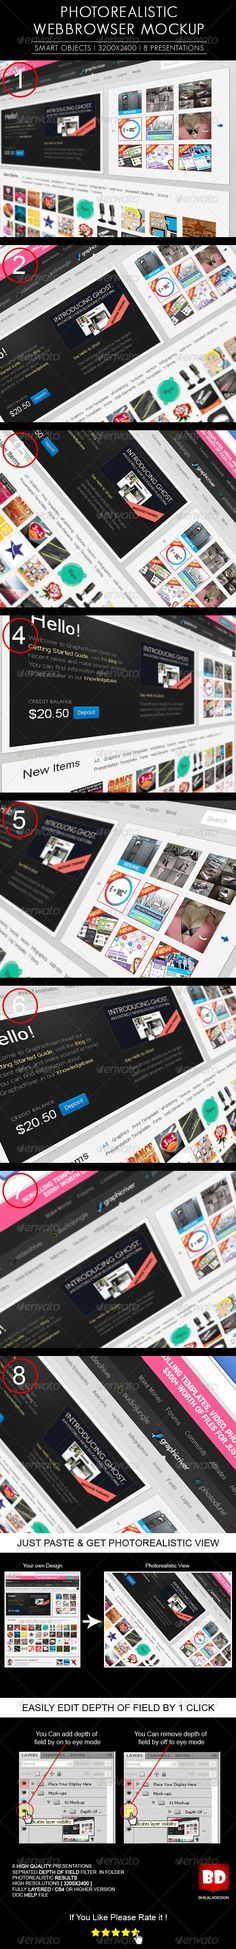 Graphicriver - Mobilisimo Mobile Phone